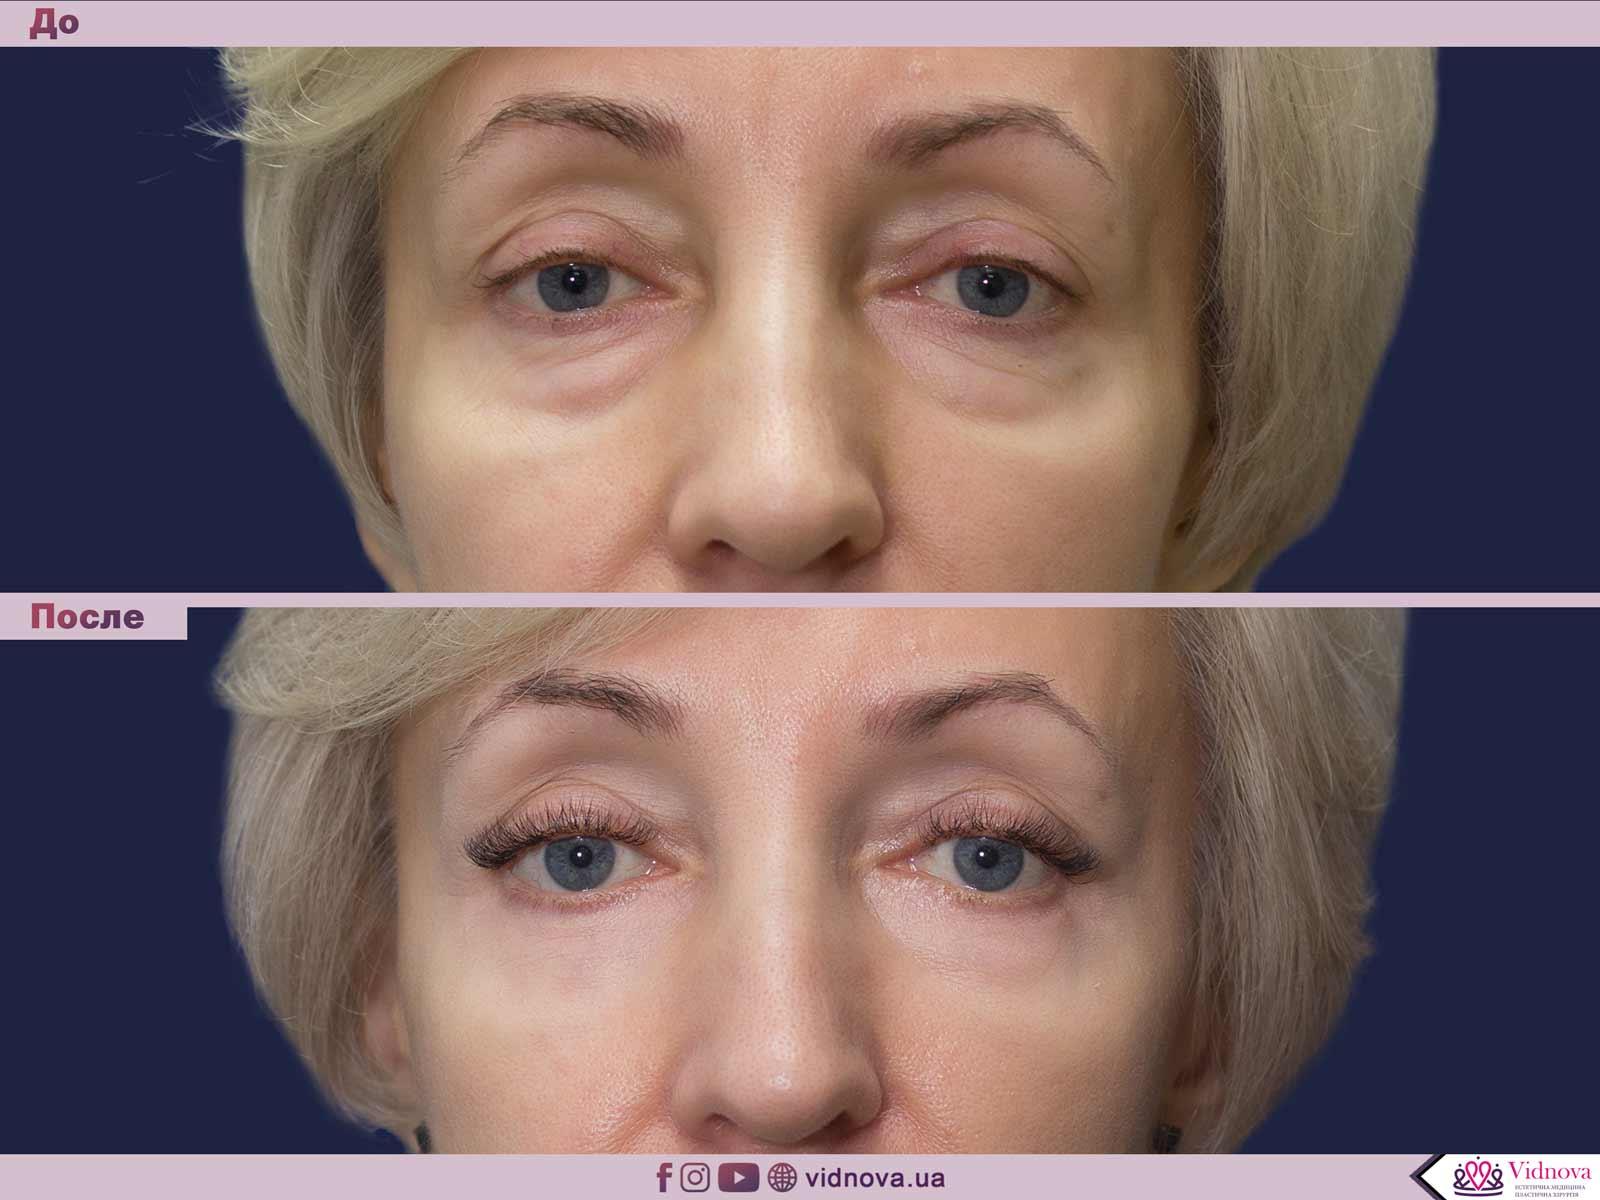 Блефаропластика: Фото До и После - Пример №42-1 - Клиника Vidnova